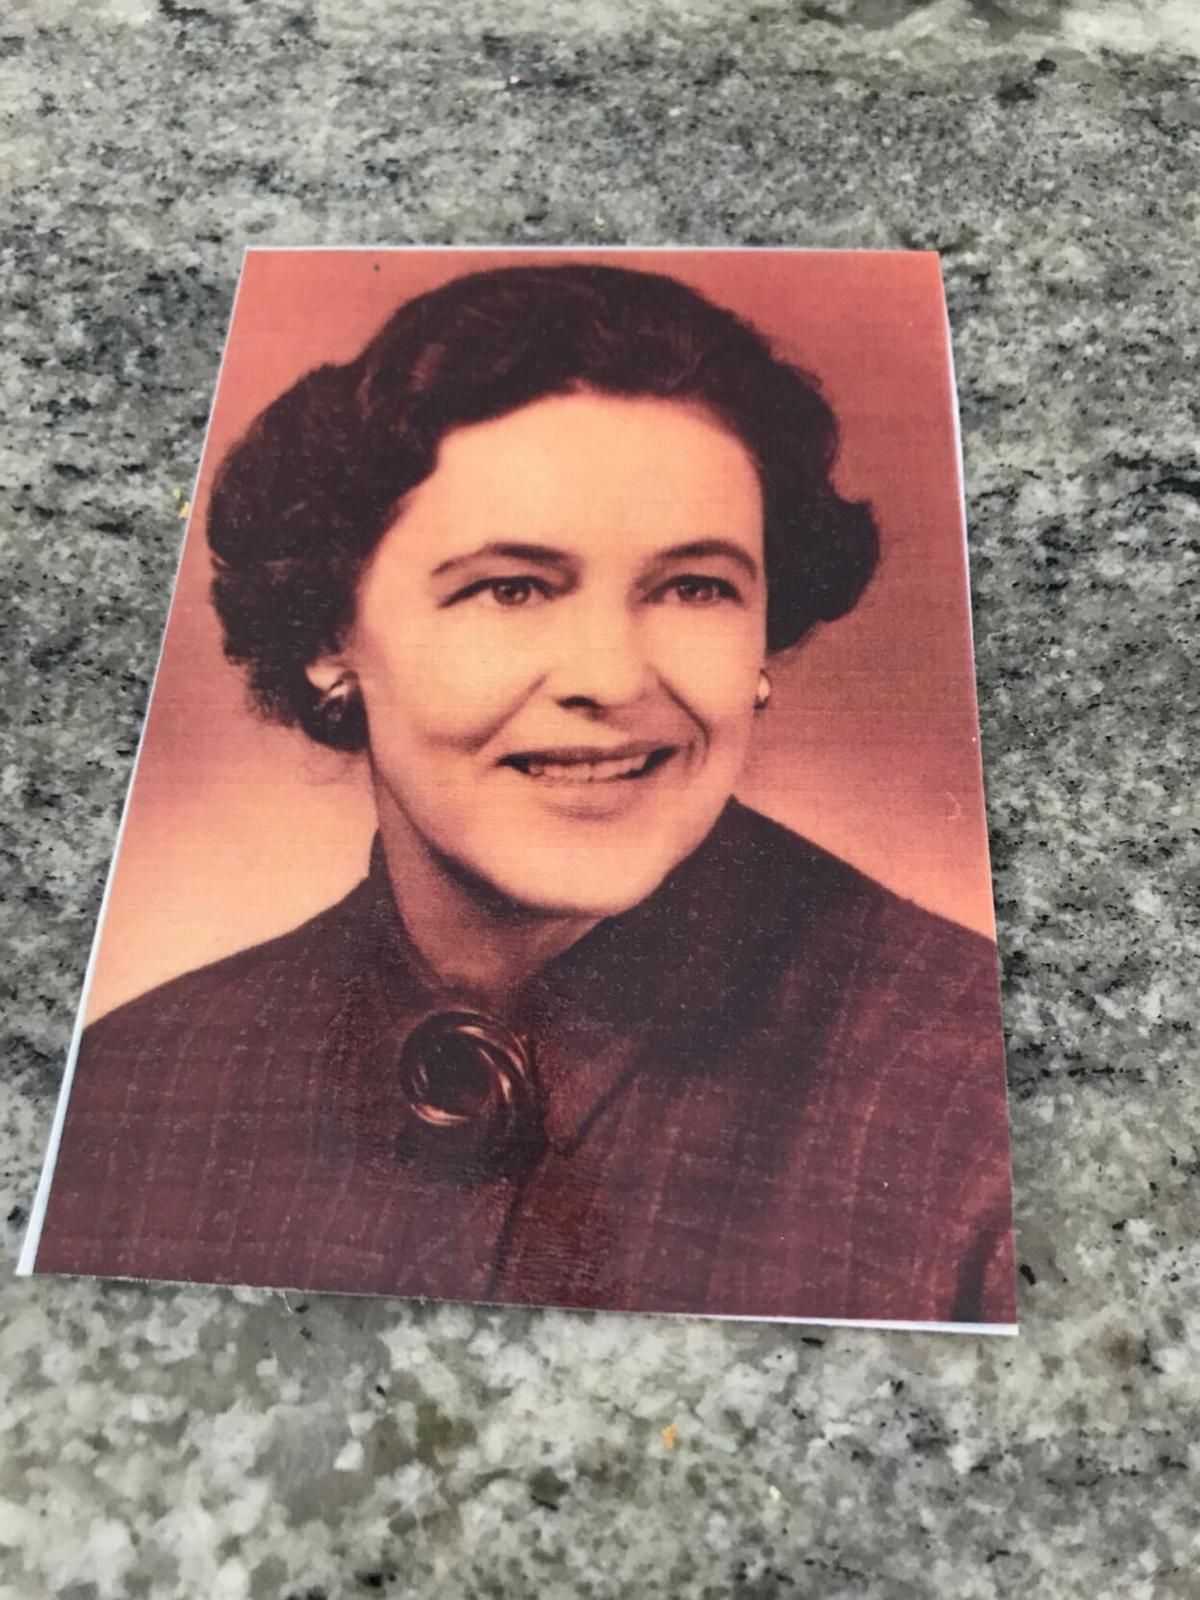 Claverack woman turning 100